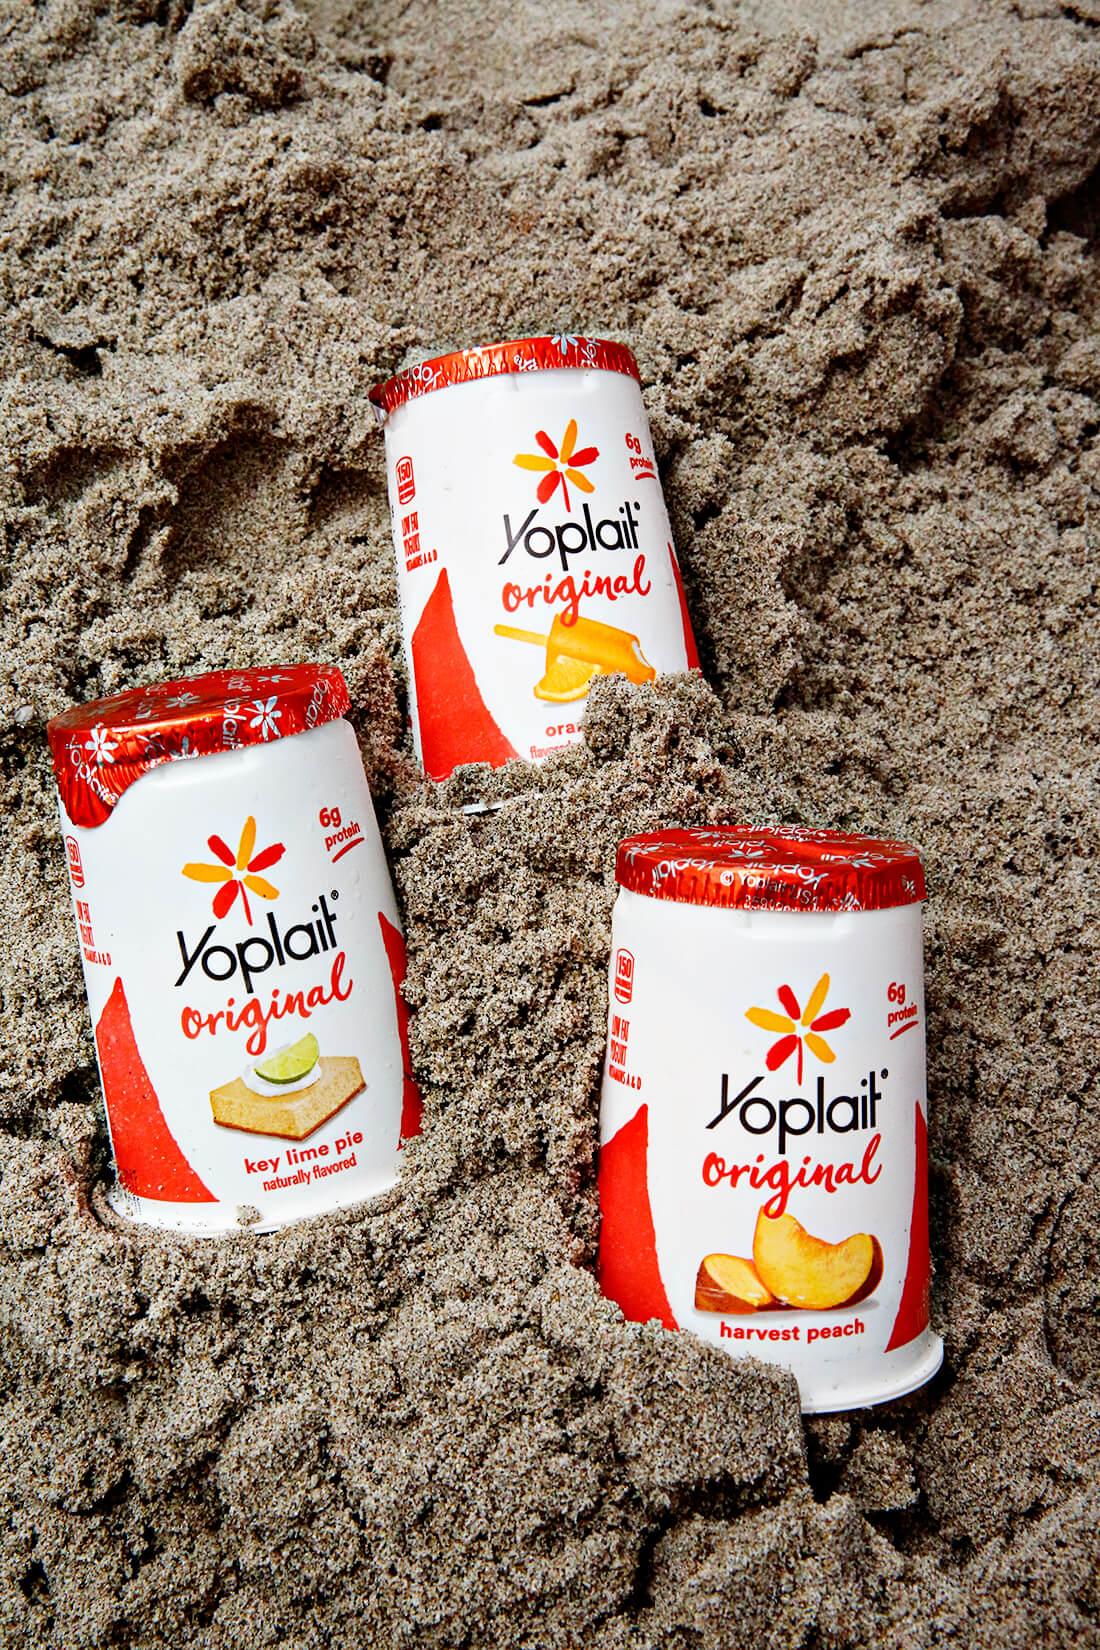 Yoplait yogurt on the beach